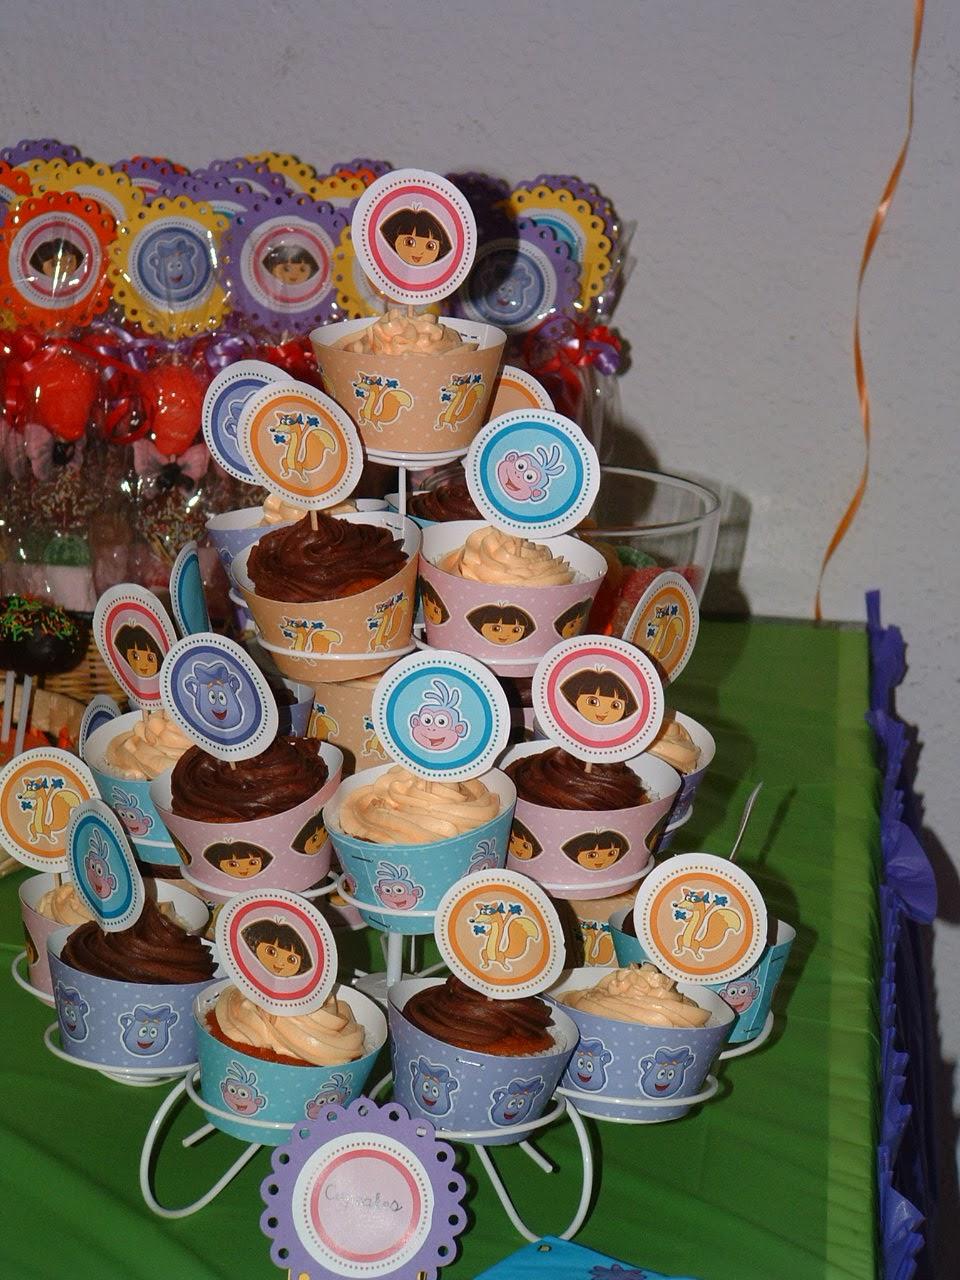 Cupcakes tenerife diciembre 2013 - Cupcakes tenerife ...